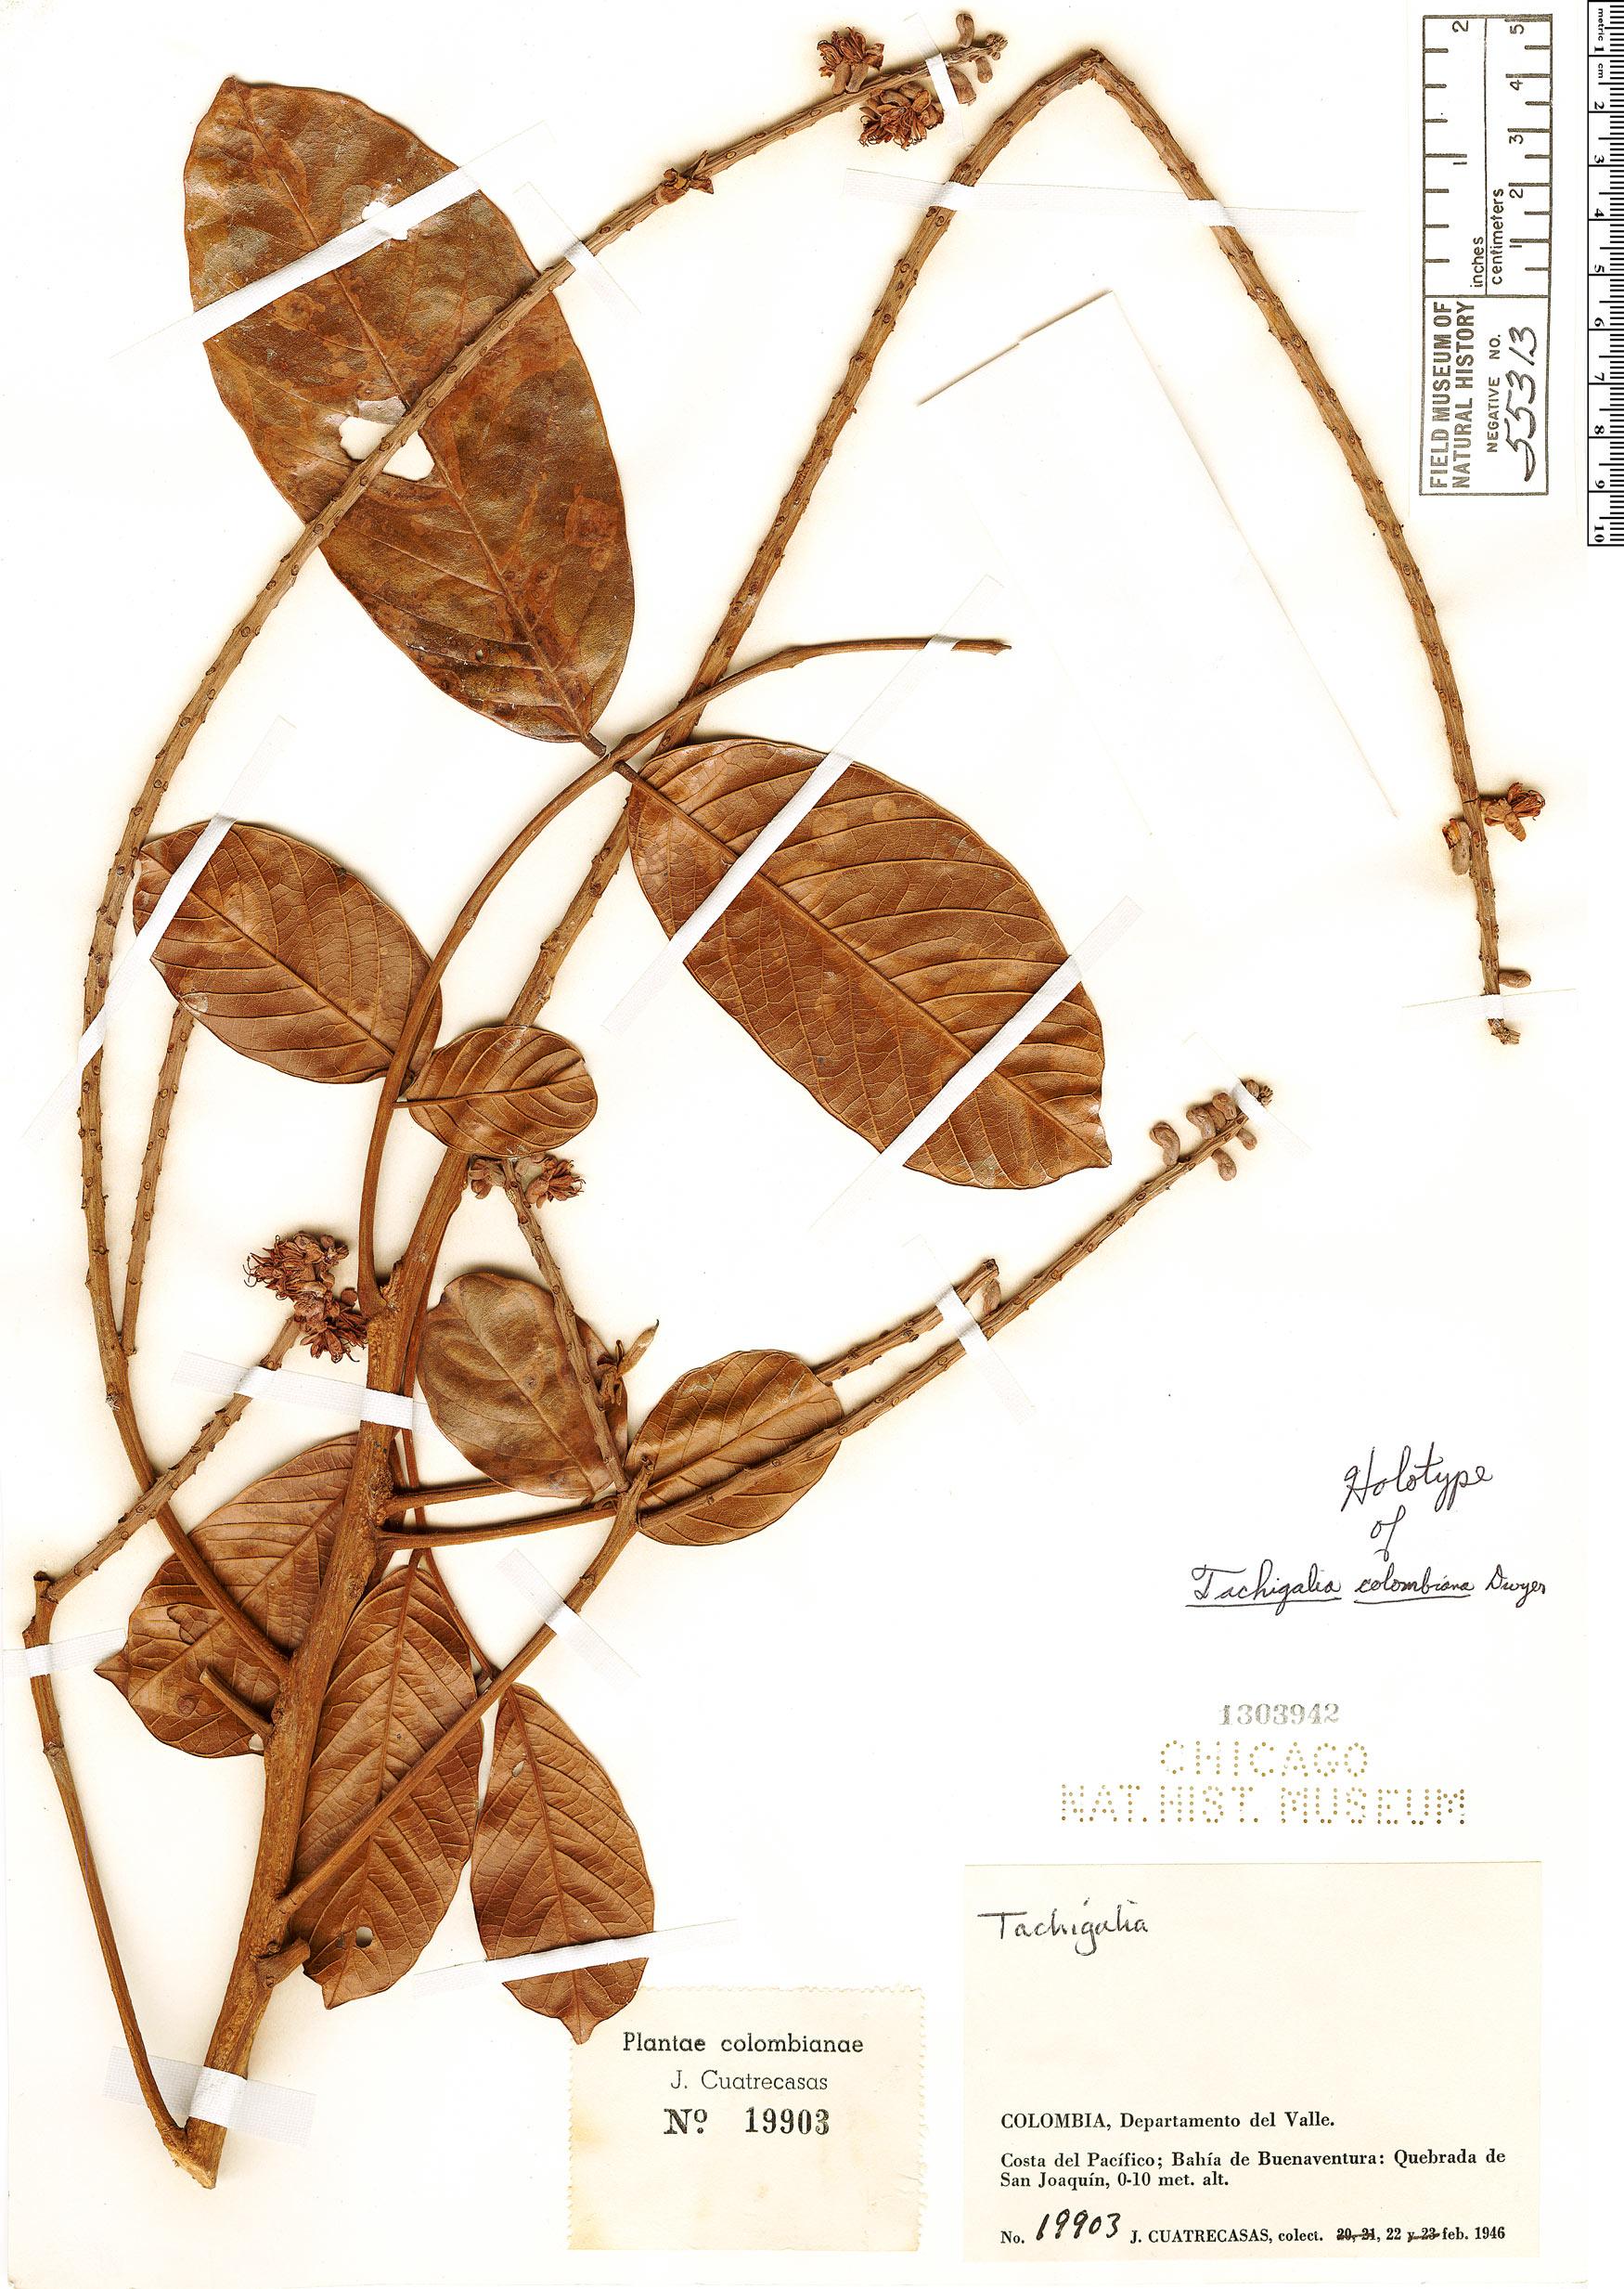 Specimen: Tachigali colombiana